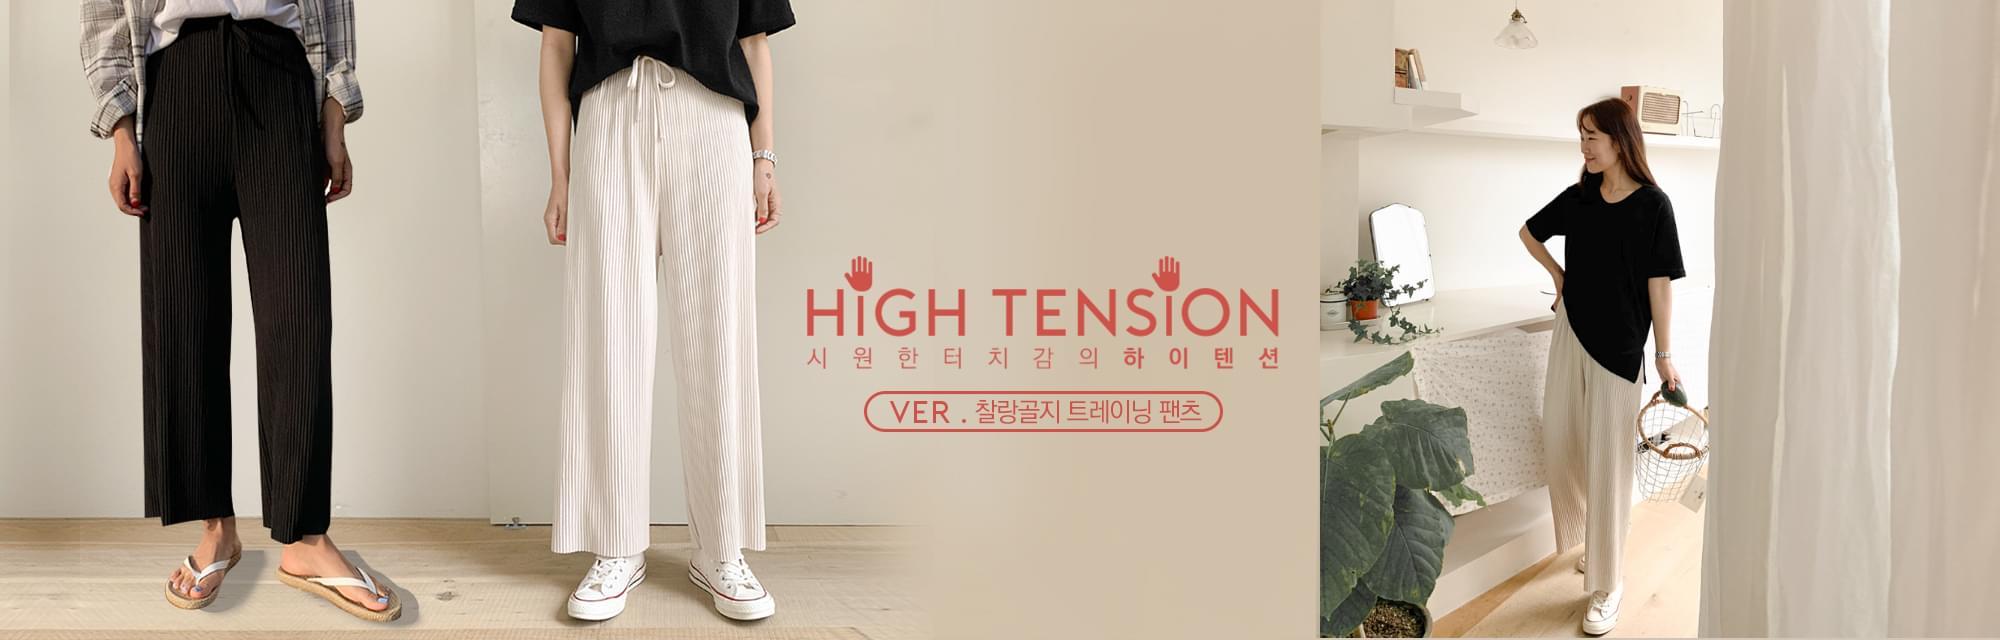 High tension. Chalange Golgi Training Pants